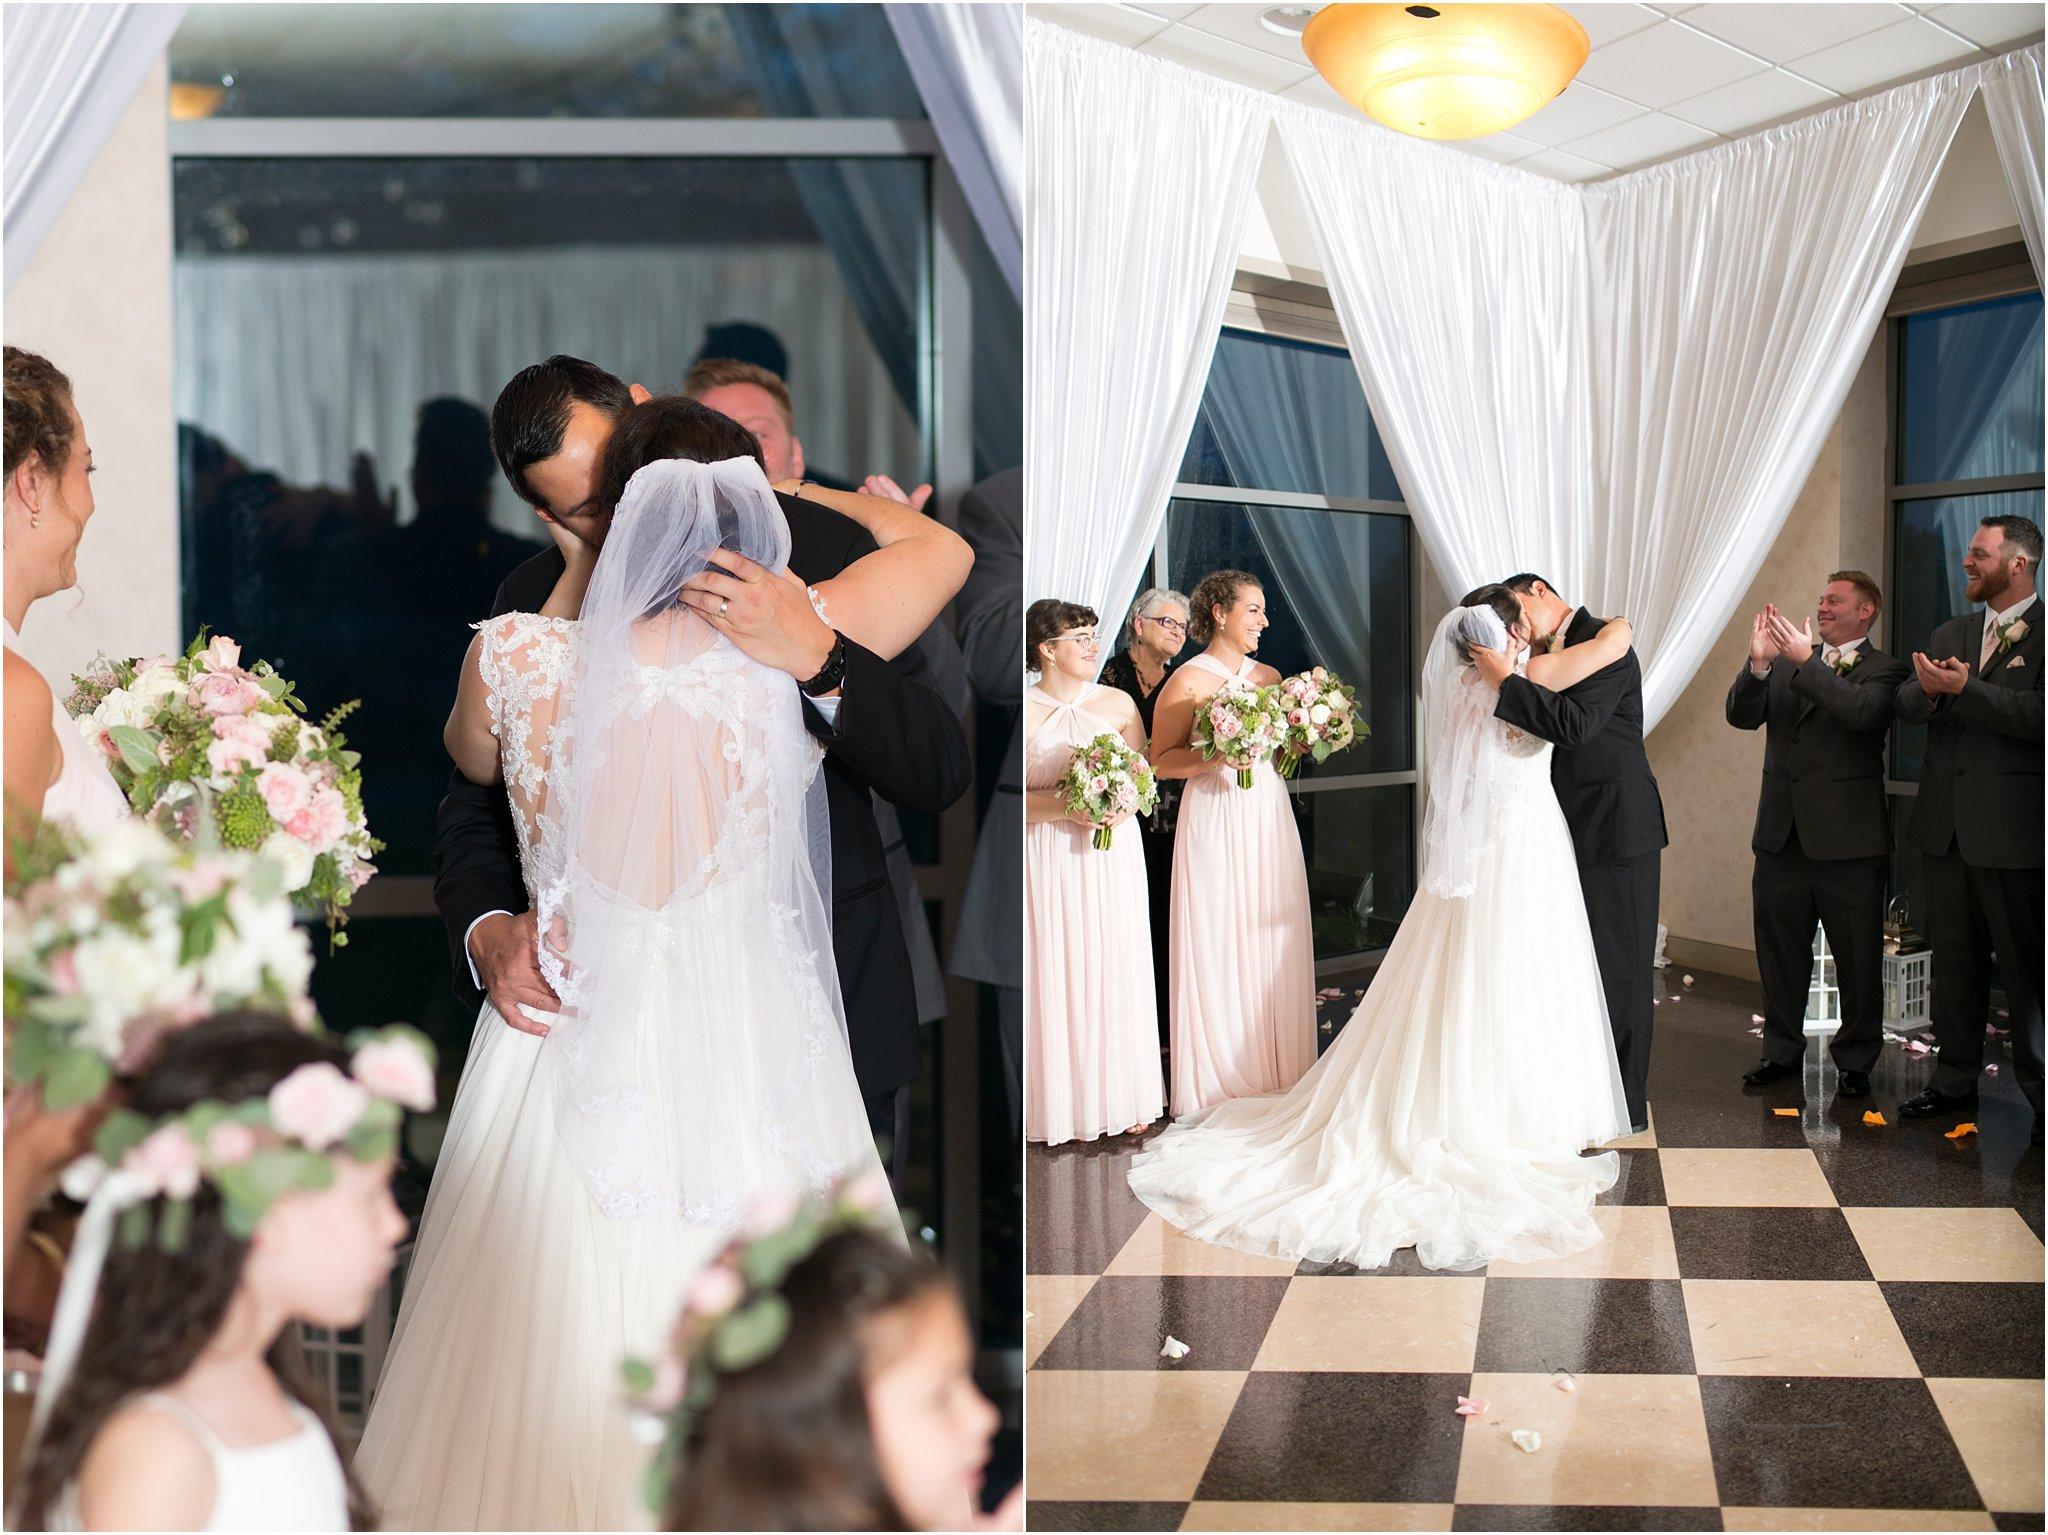 jessica_ryan_photography_virginia_wedding_photographer_wedding_hurricane_norfolk_botanical_gardens_hurricane_matthew_wedding_3596